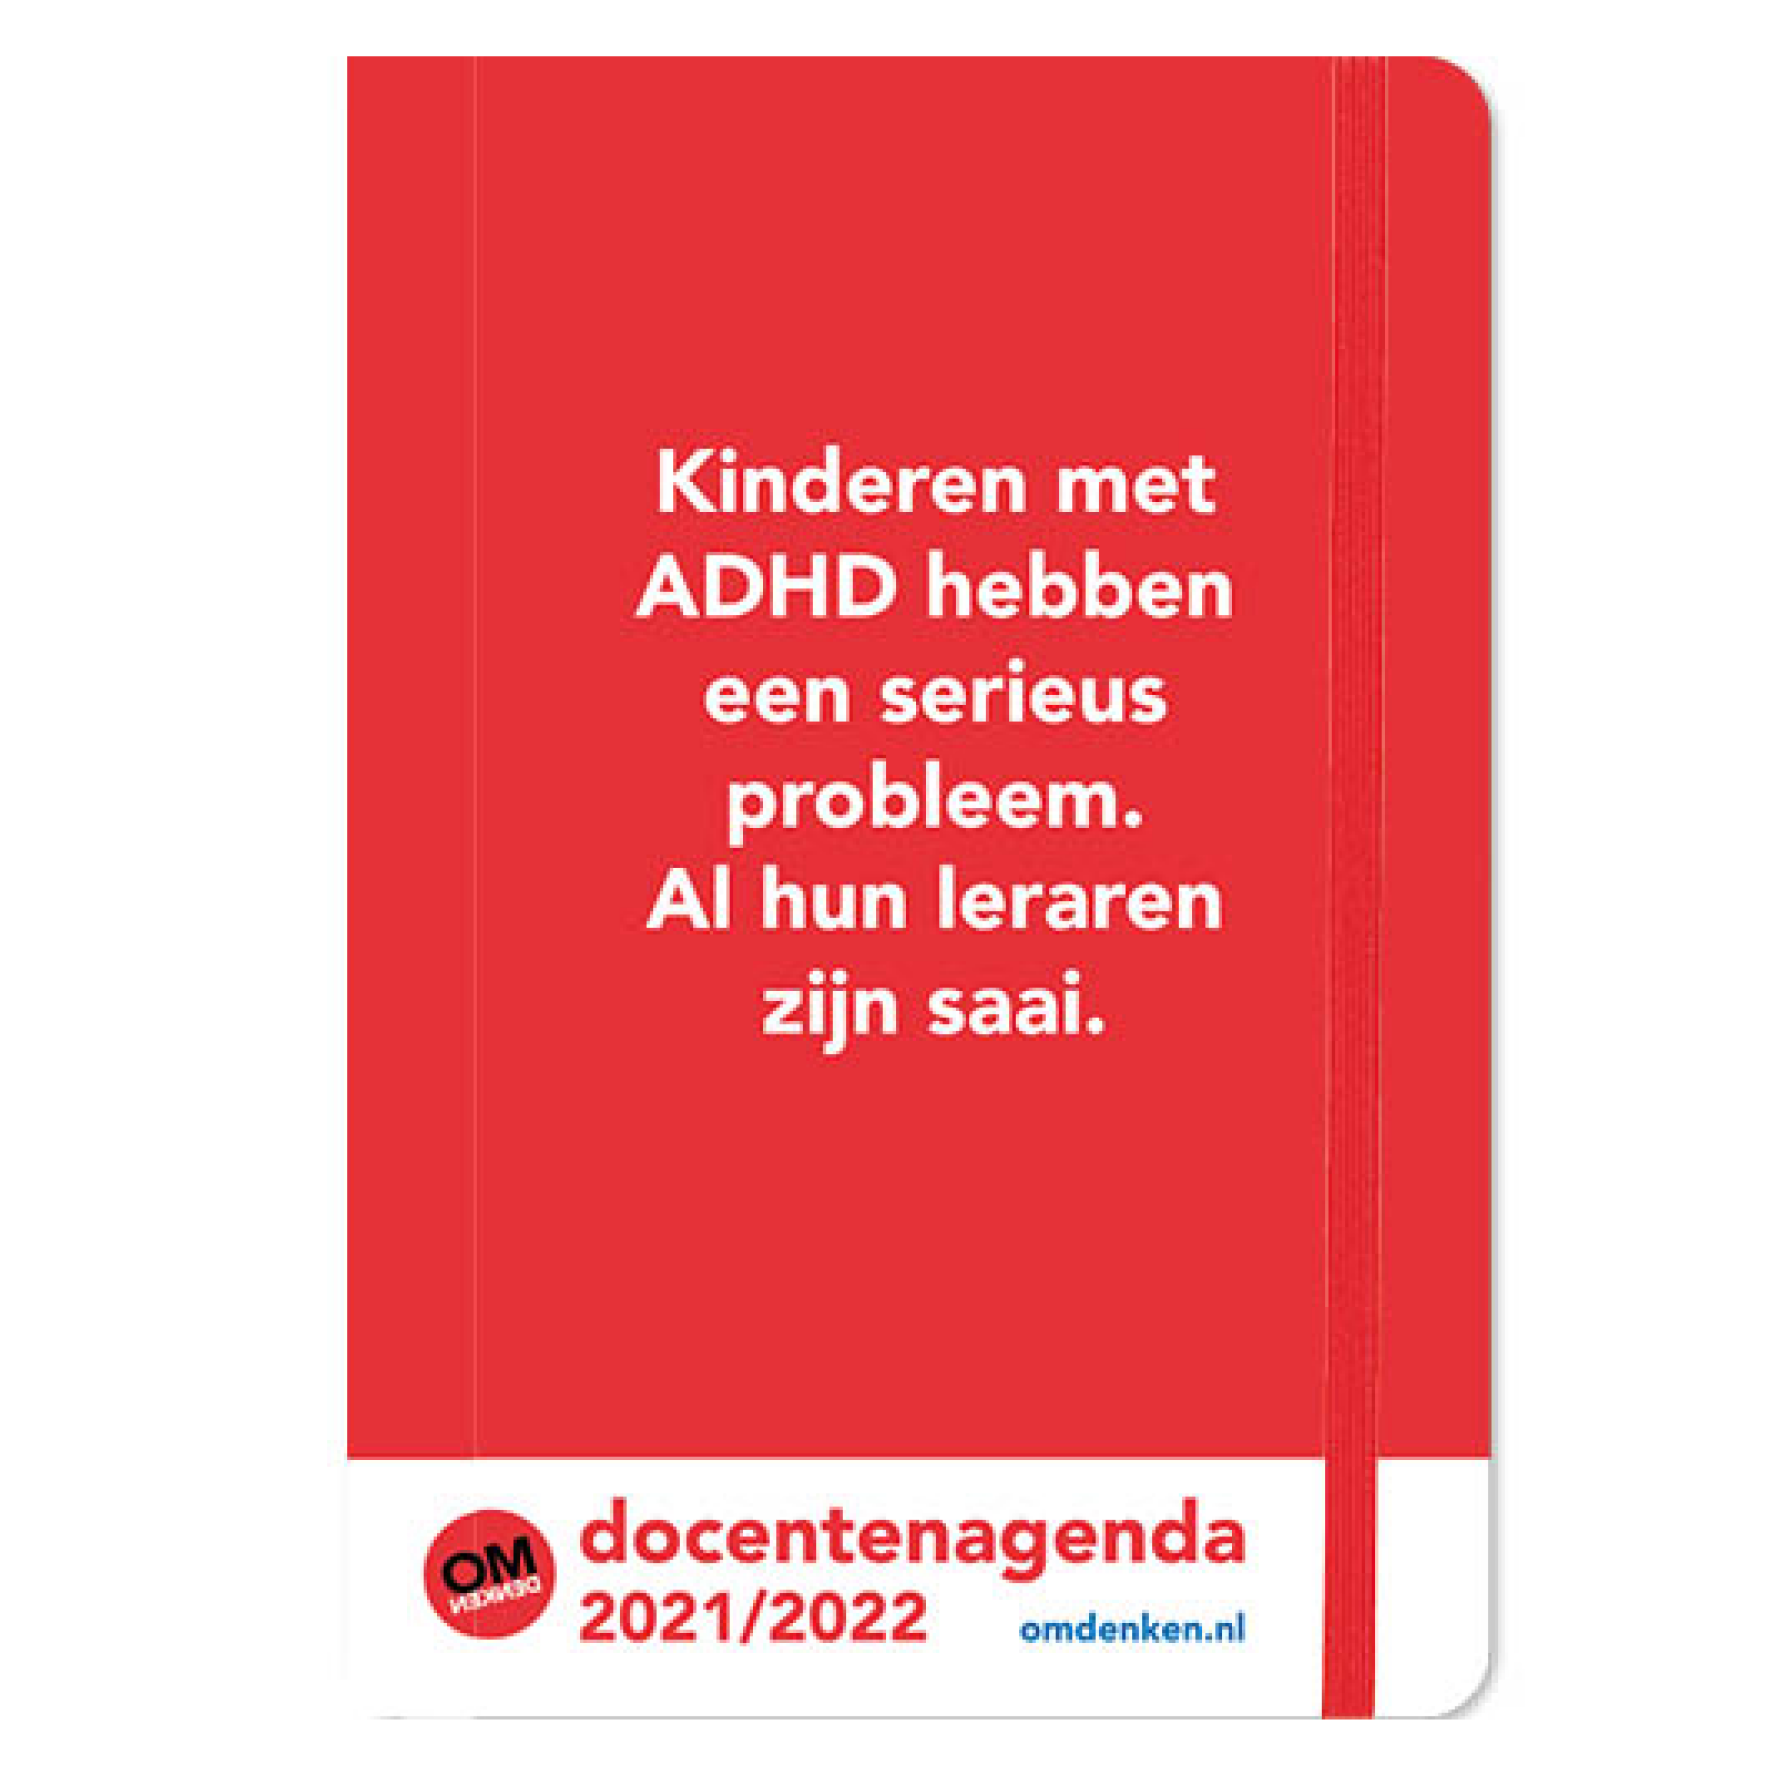 Agenda - 2022 - Docentenagenda - Omdenken - A5 - 14,8x21cm